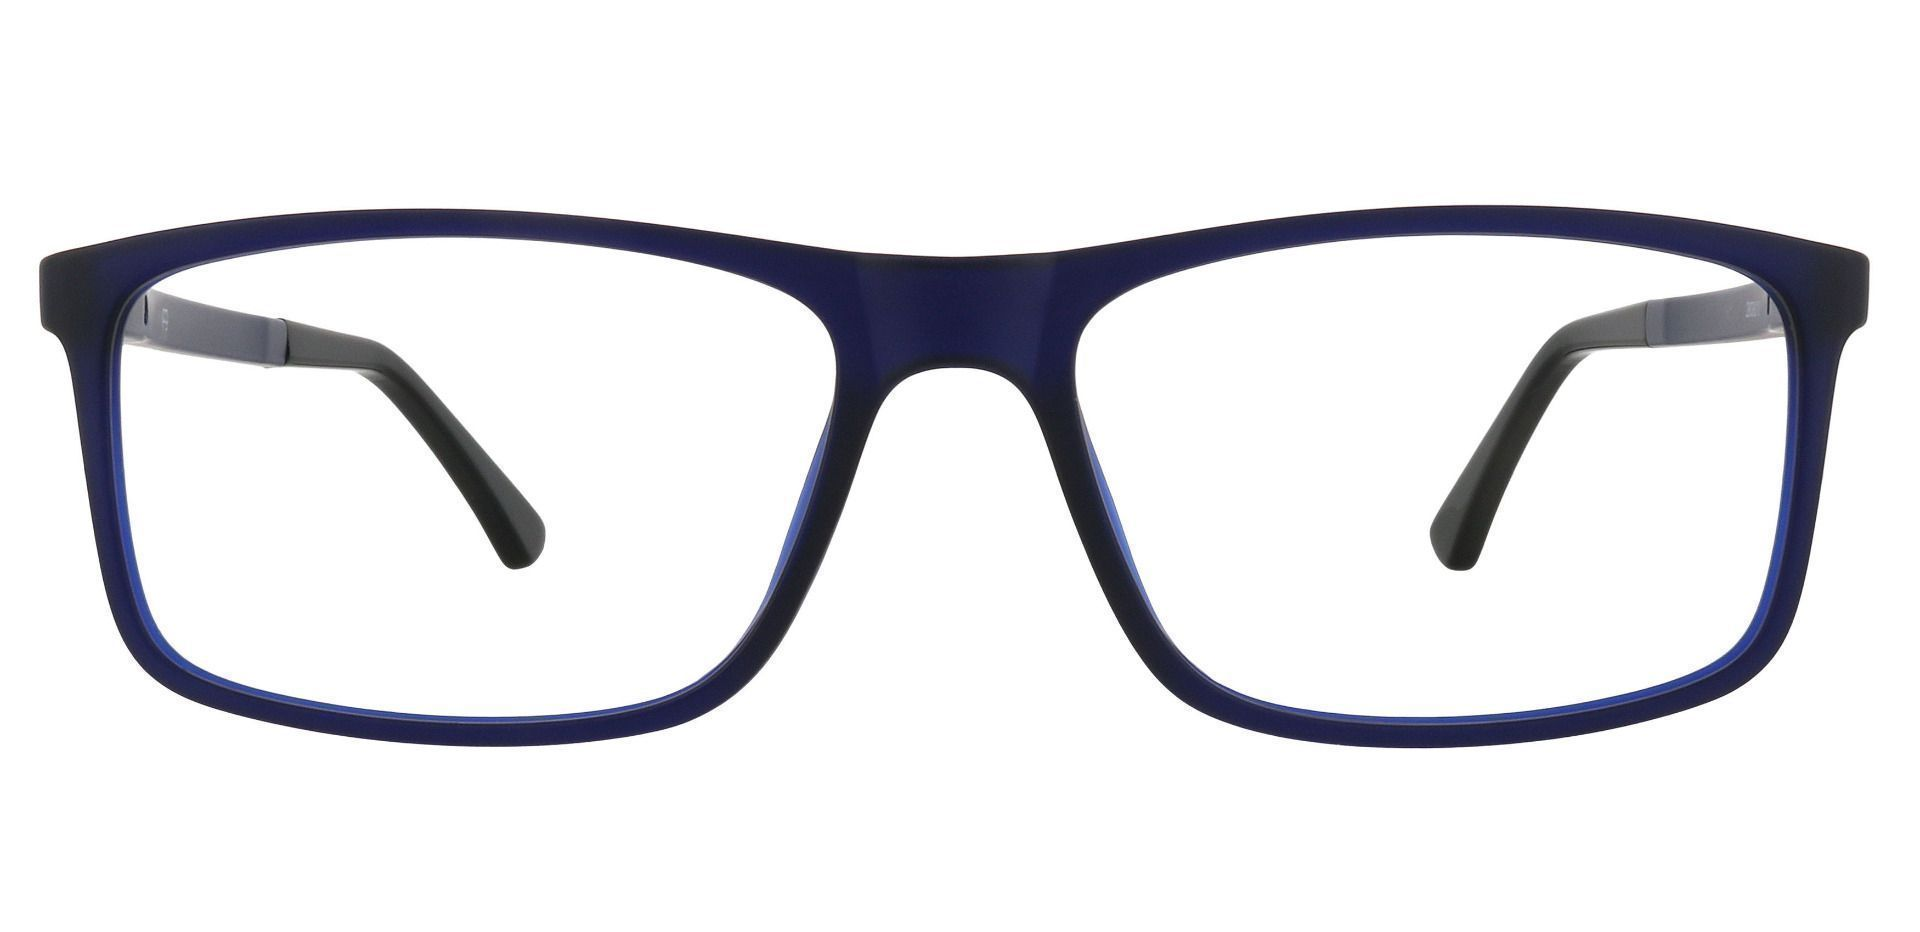 Montana Rectangle Prescription Glasses - Dark Navy